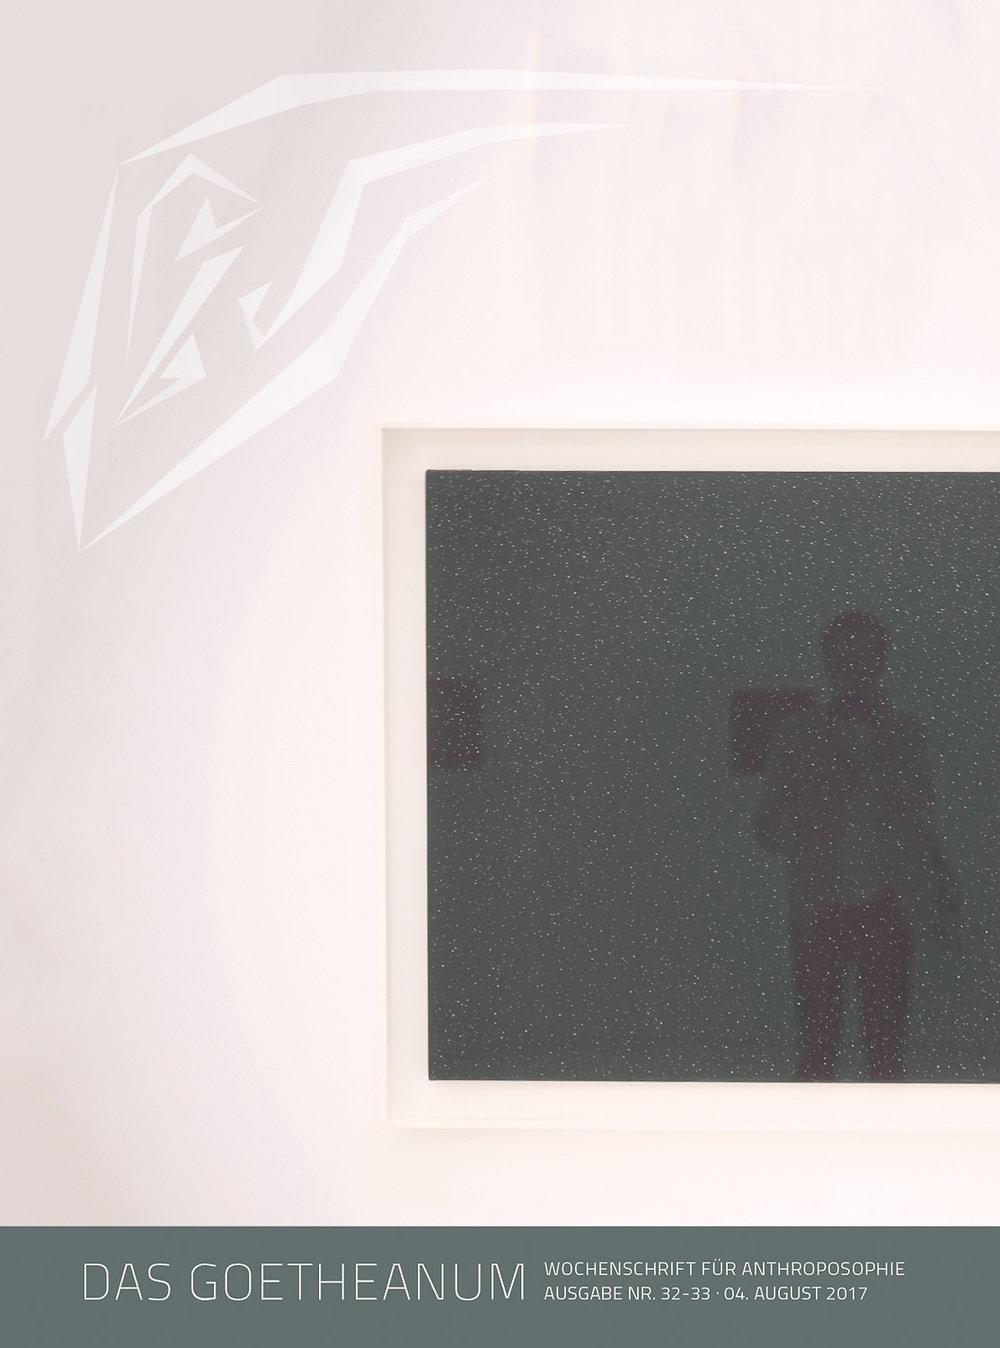 G2017_32-33_Cover_Kunst_ng- Squarespace.jpg